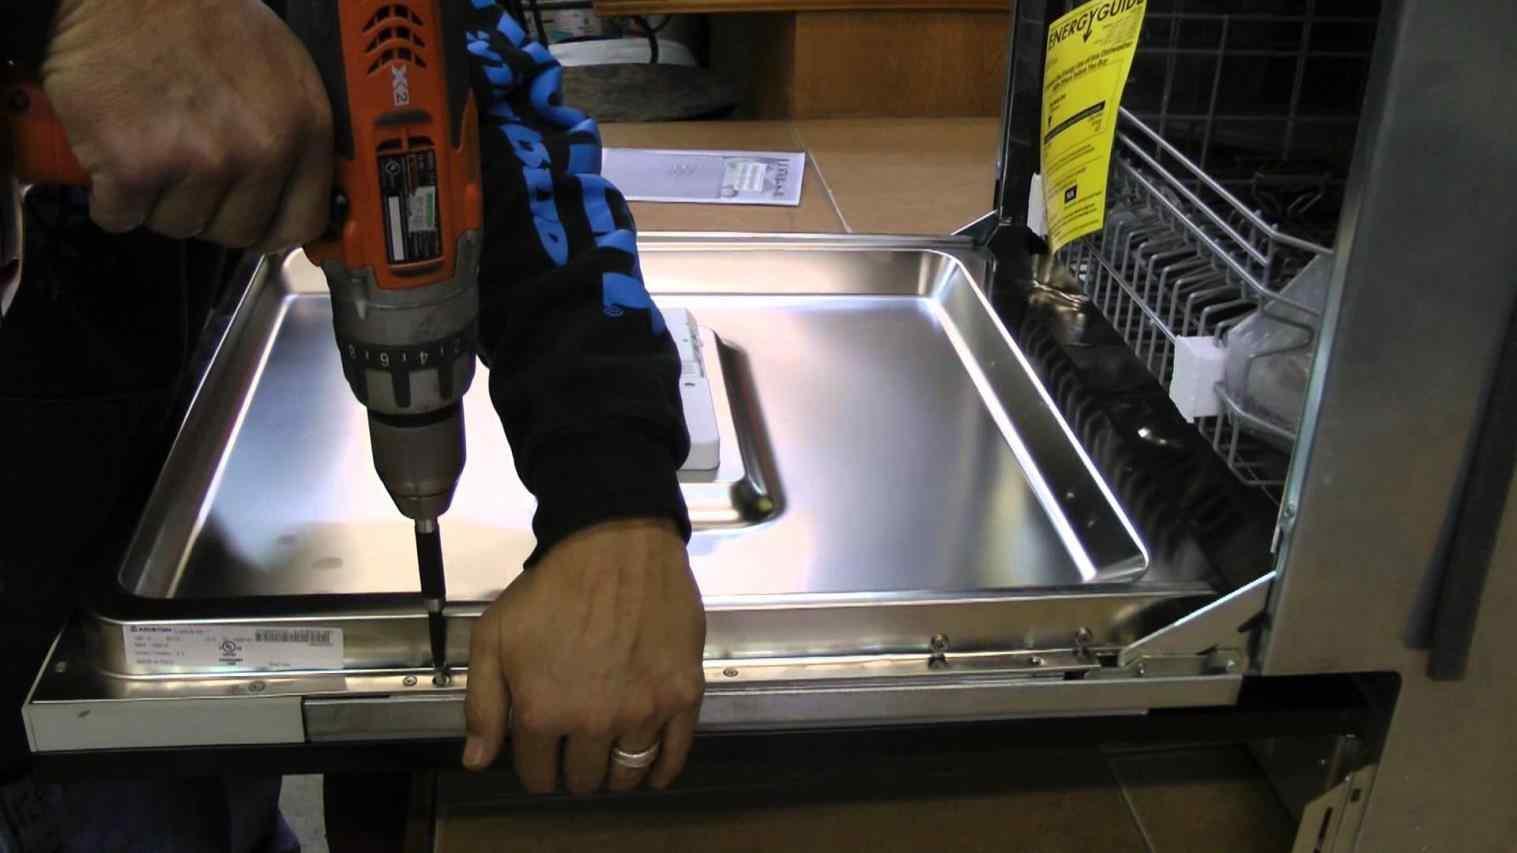 Sửa máy rửa bát Café